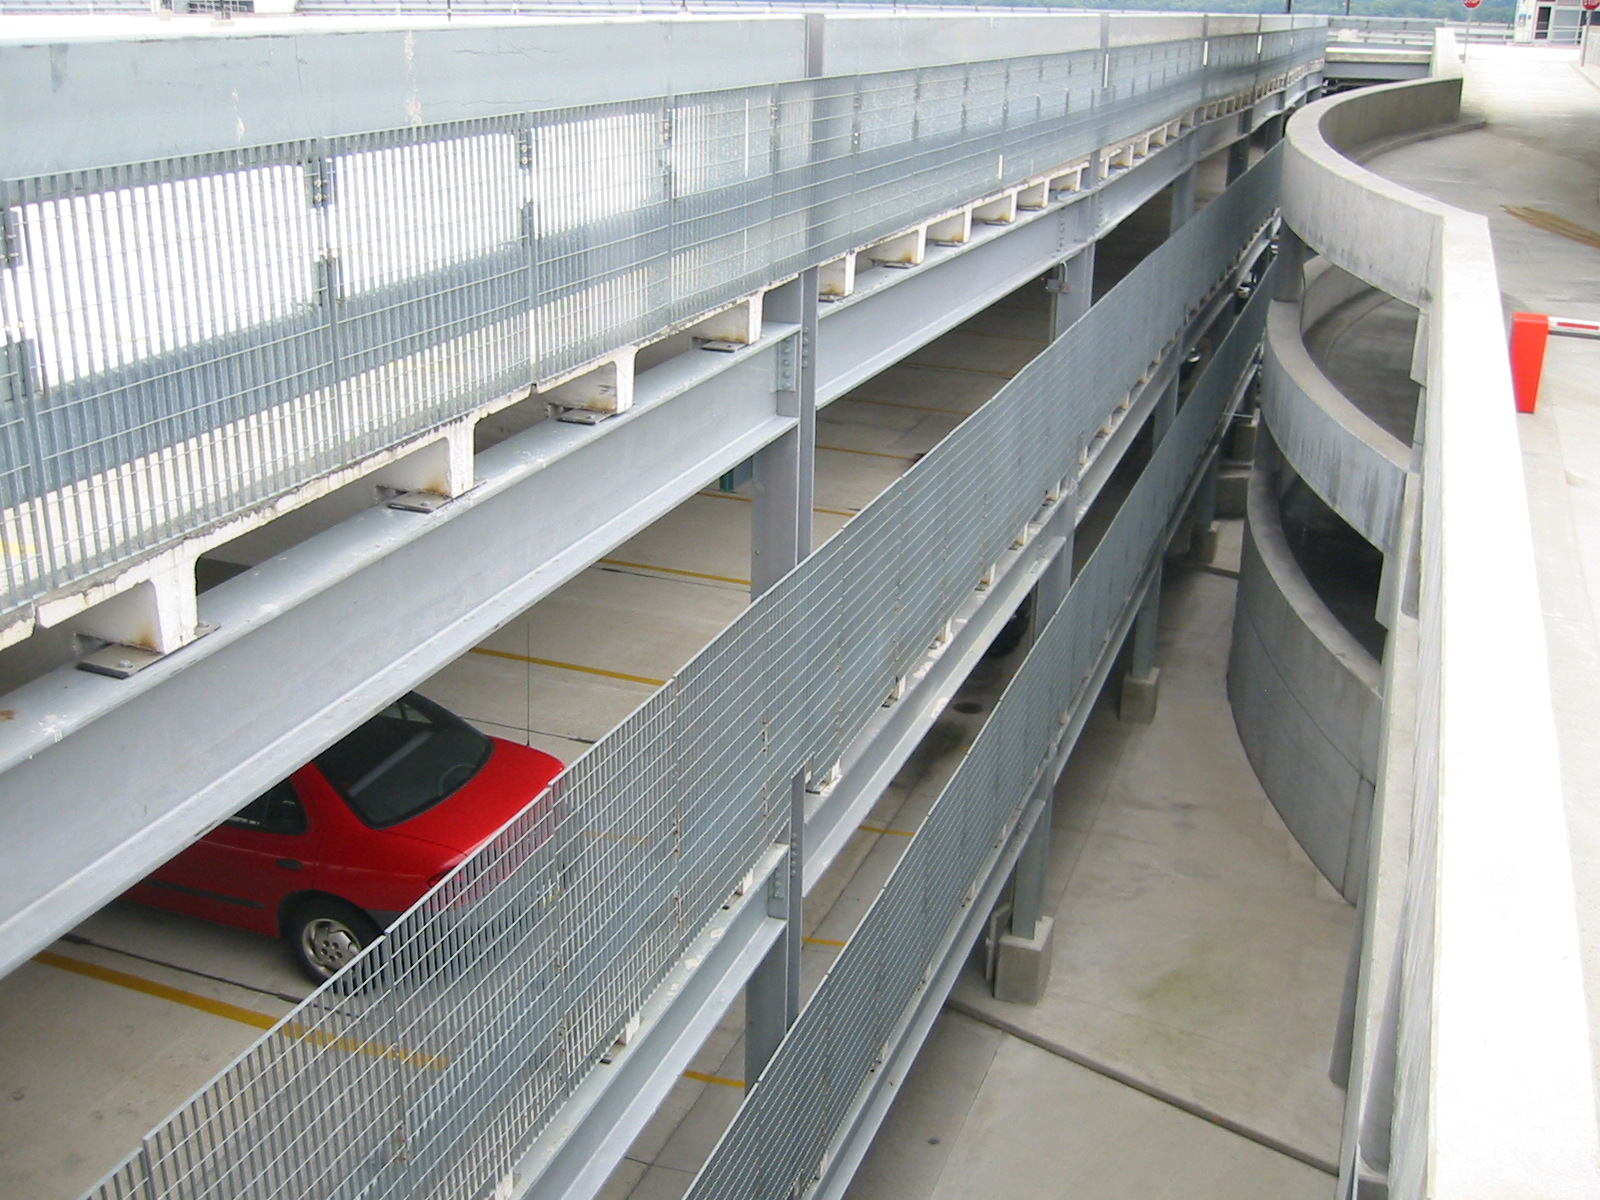 parking garages american institute of steel construction harrisburg international airport harrisburg pa